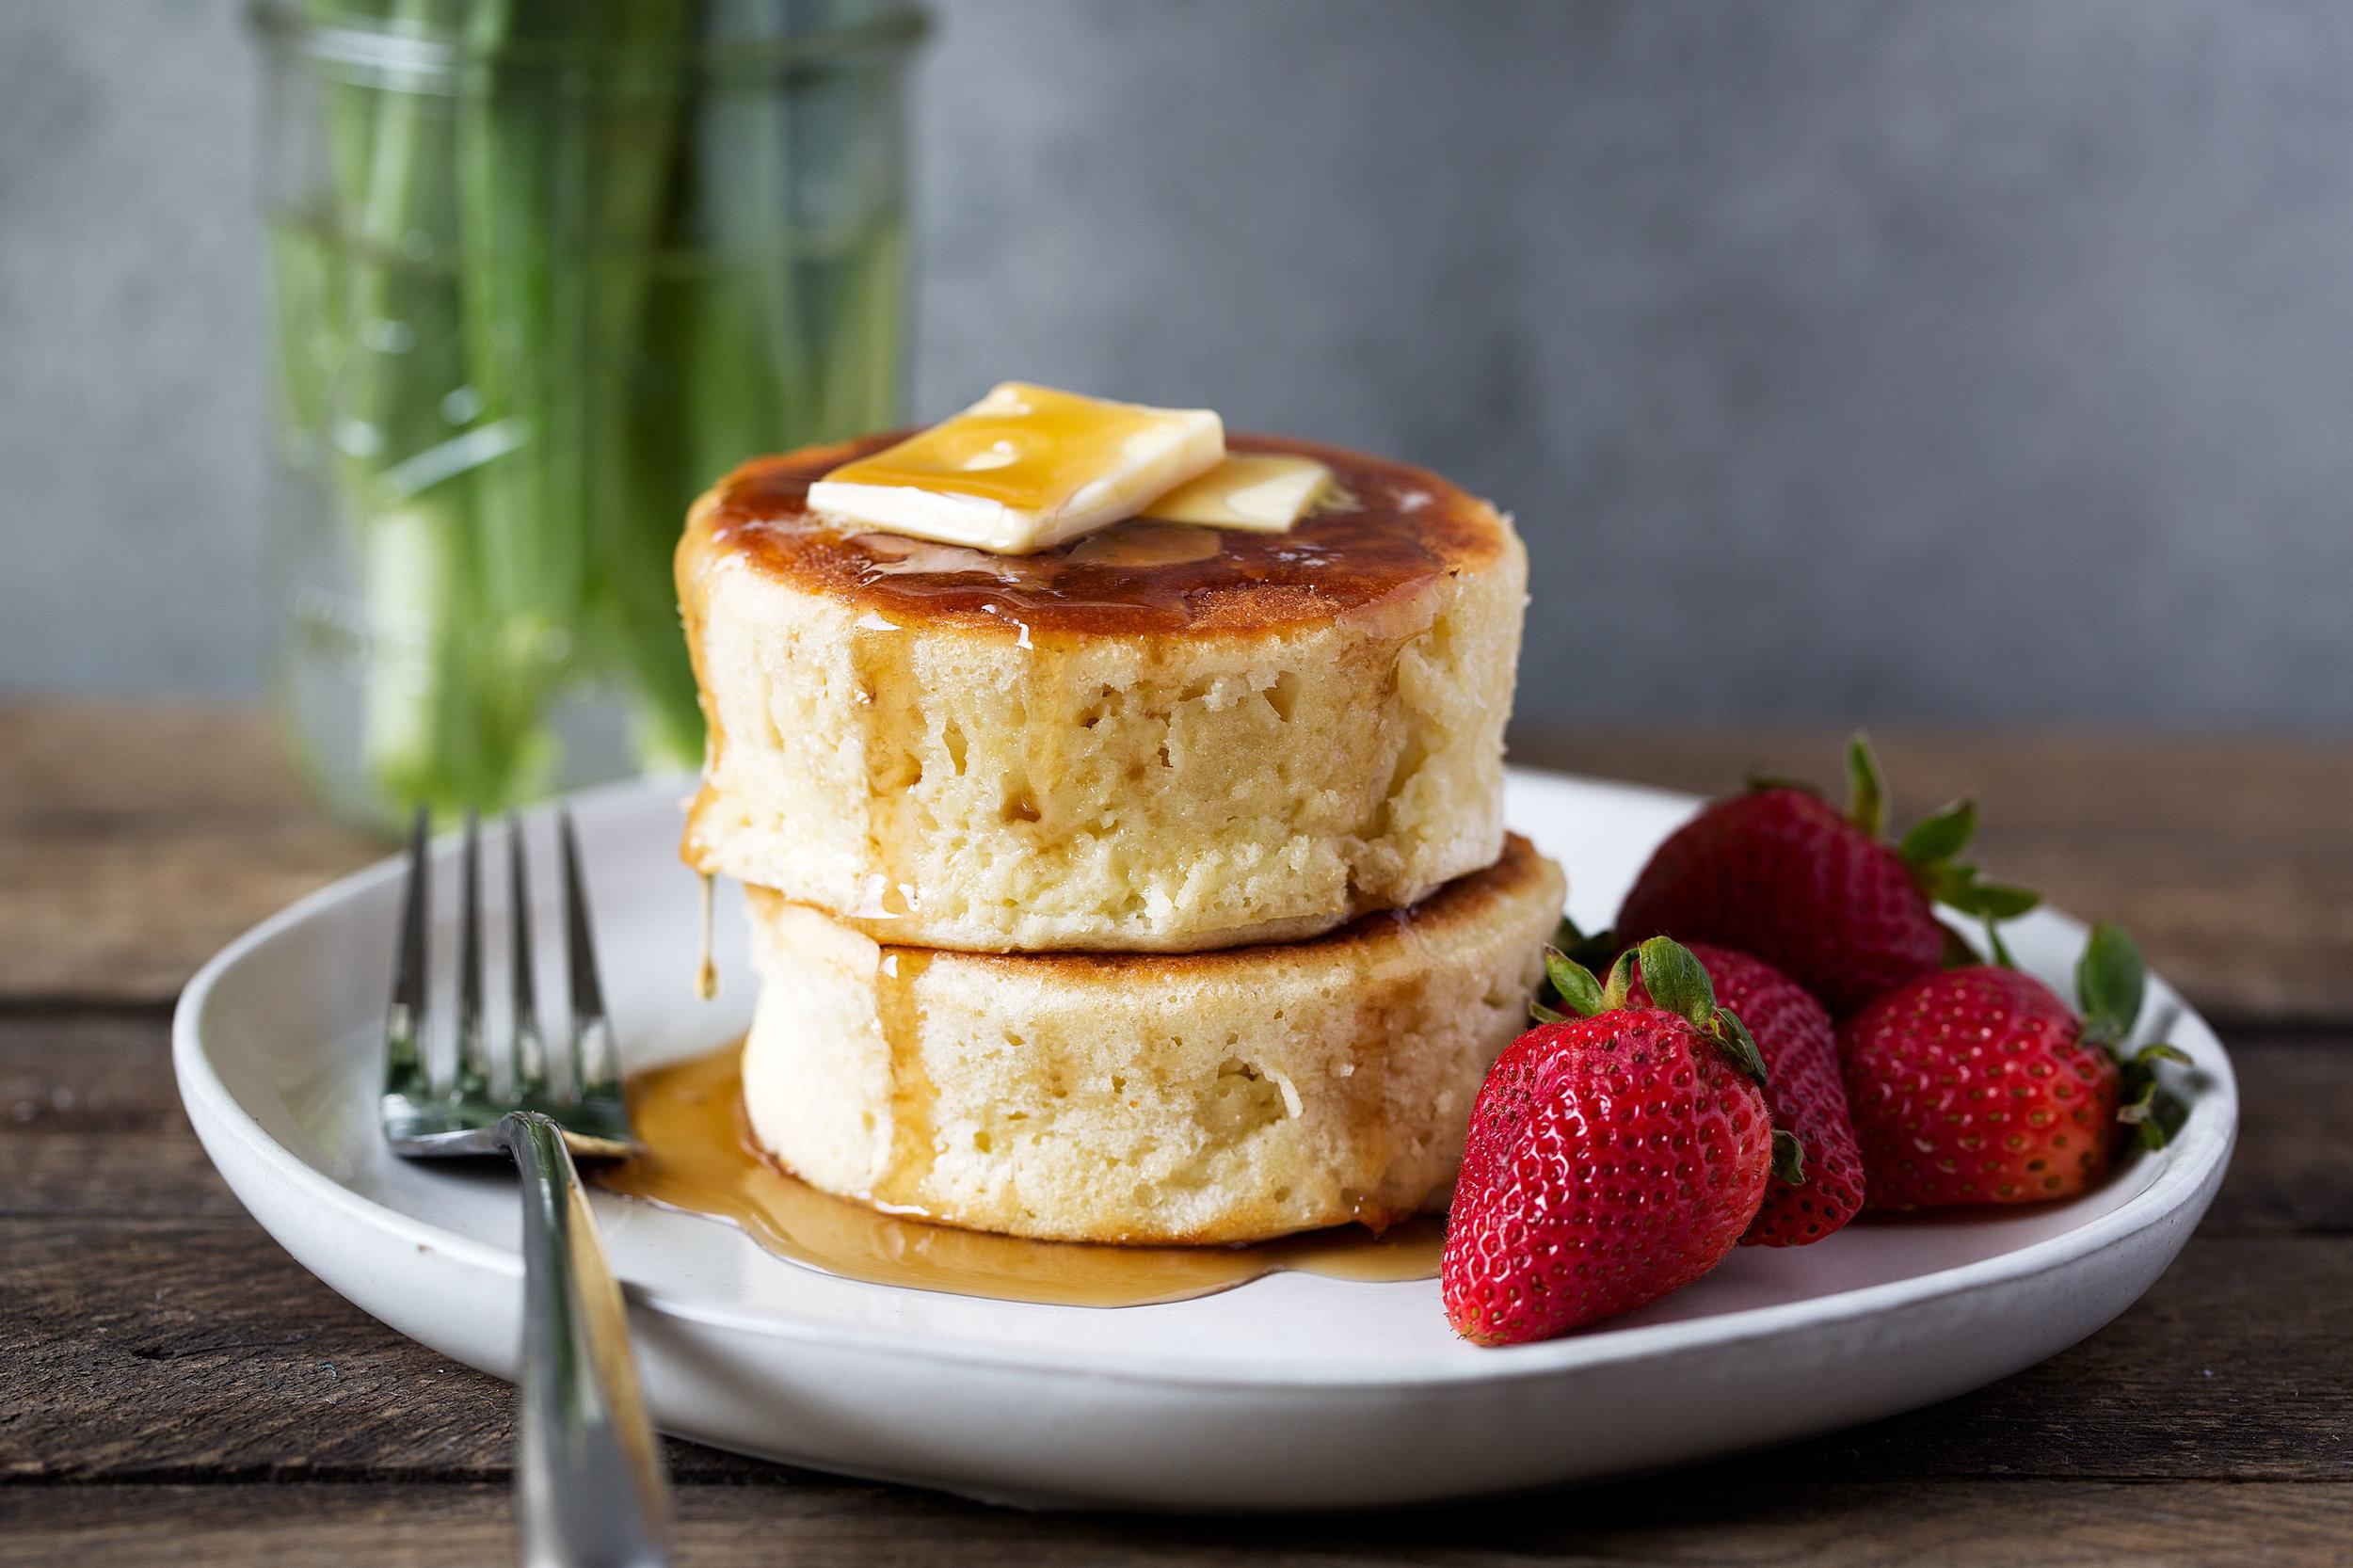 Japanese-style Soufflé Pancakes